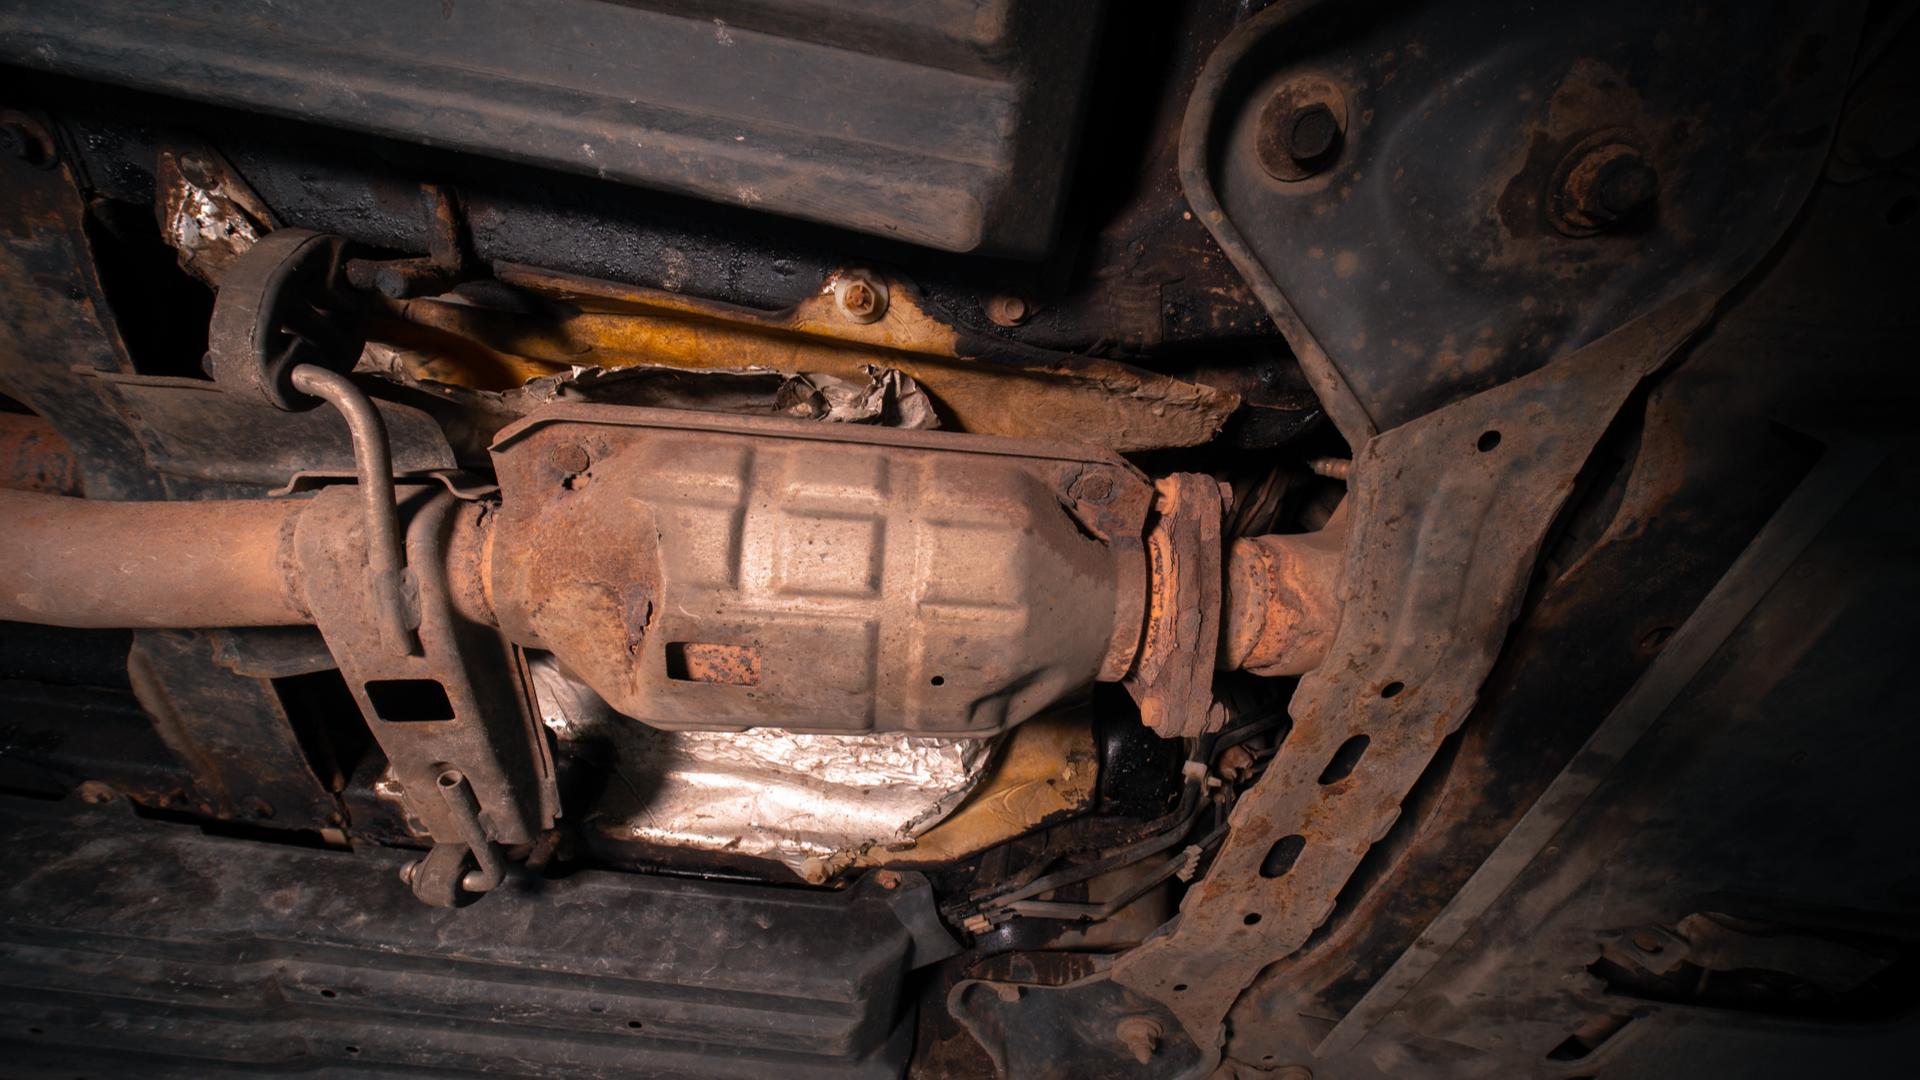 catalisador carro chassi assoalho shutterstock 1891980973